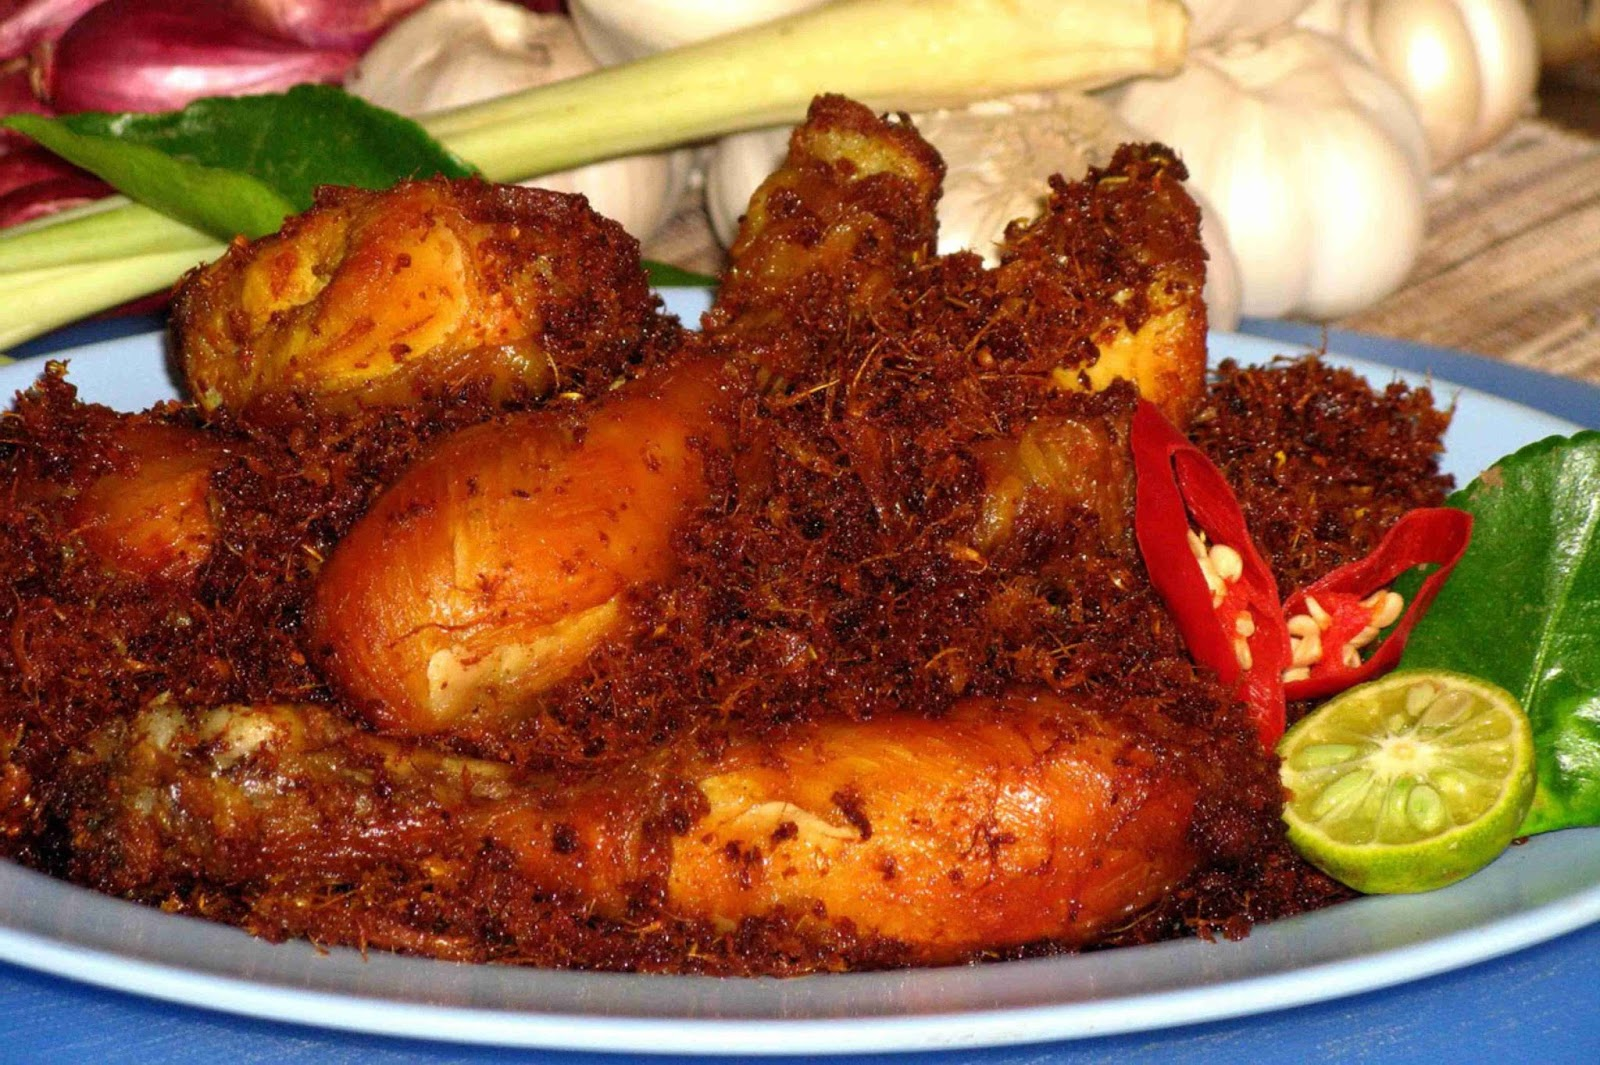 resep ayam bakar jahe soalan Resepi Nasi Uduk Betawi Asli Enak dan Mudah